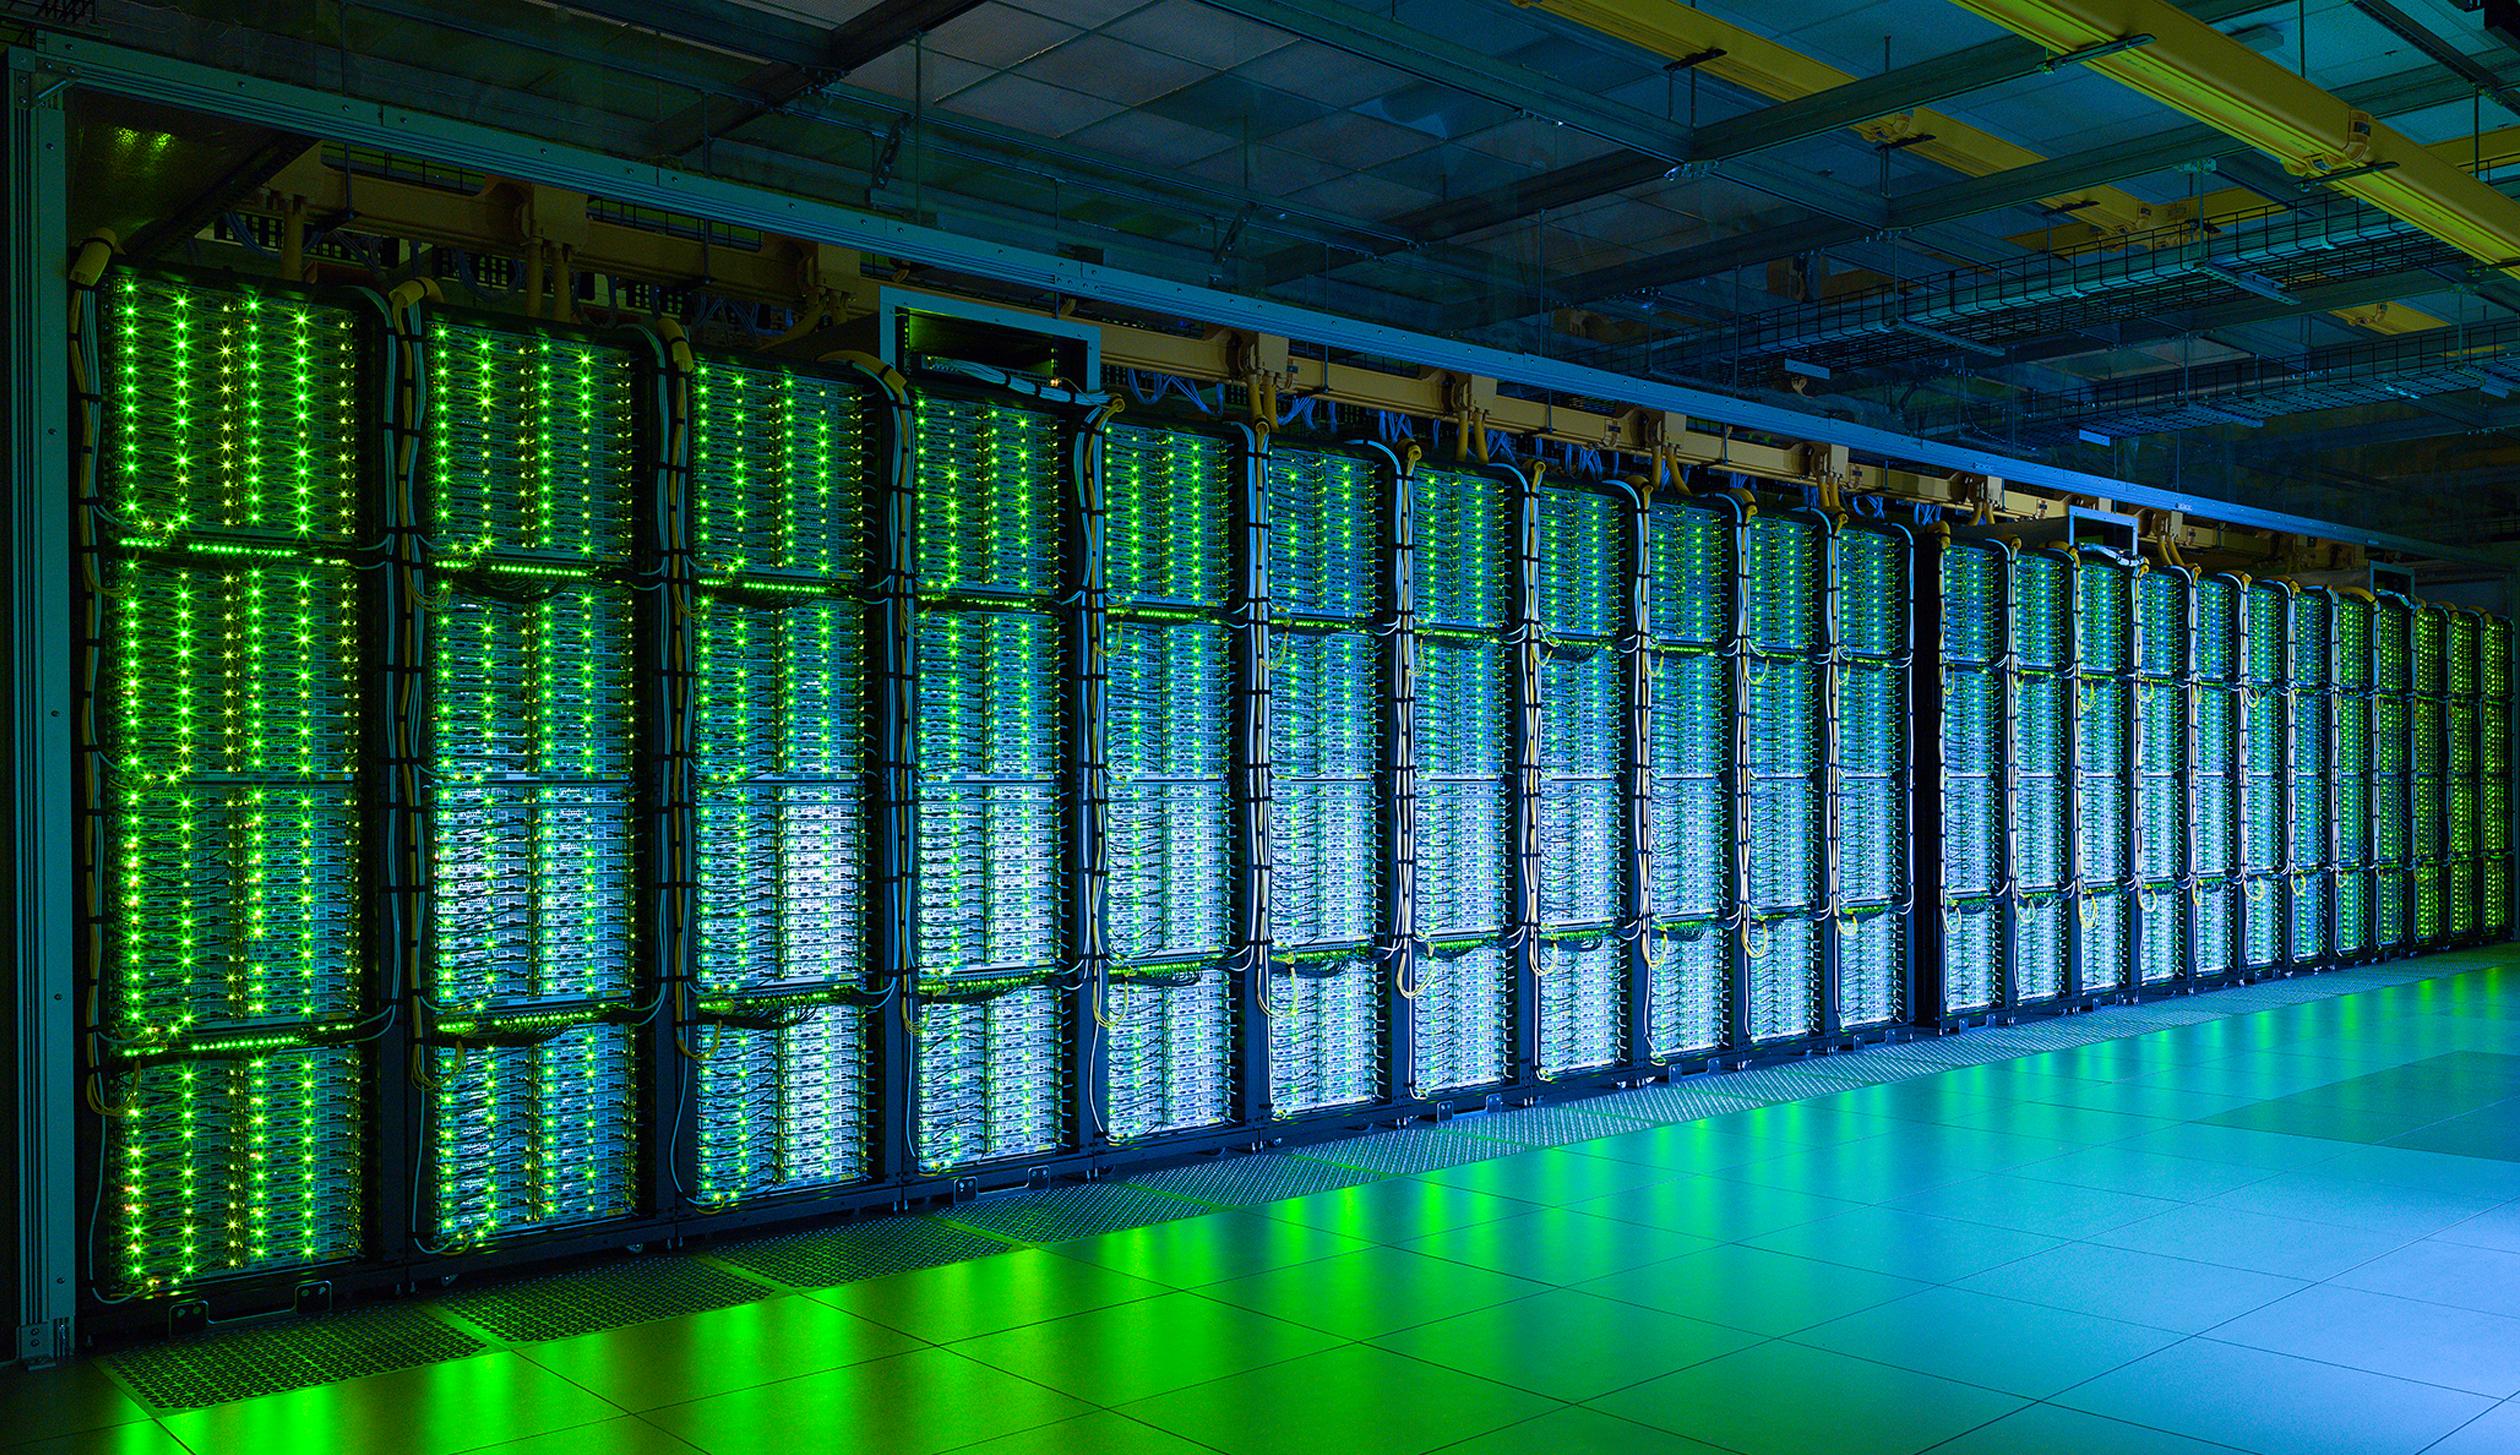 Cloud Computing's Big, Disruptive Multiple-Billion-Dollar